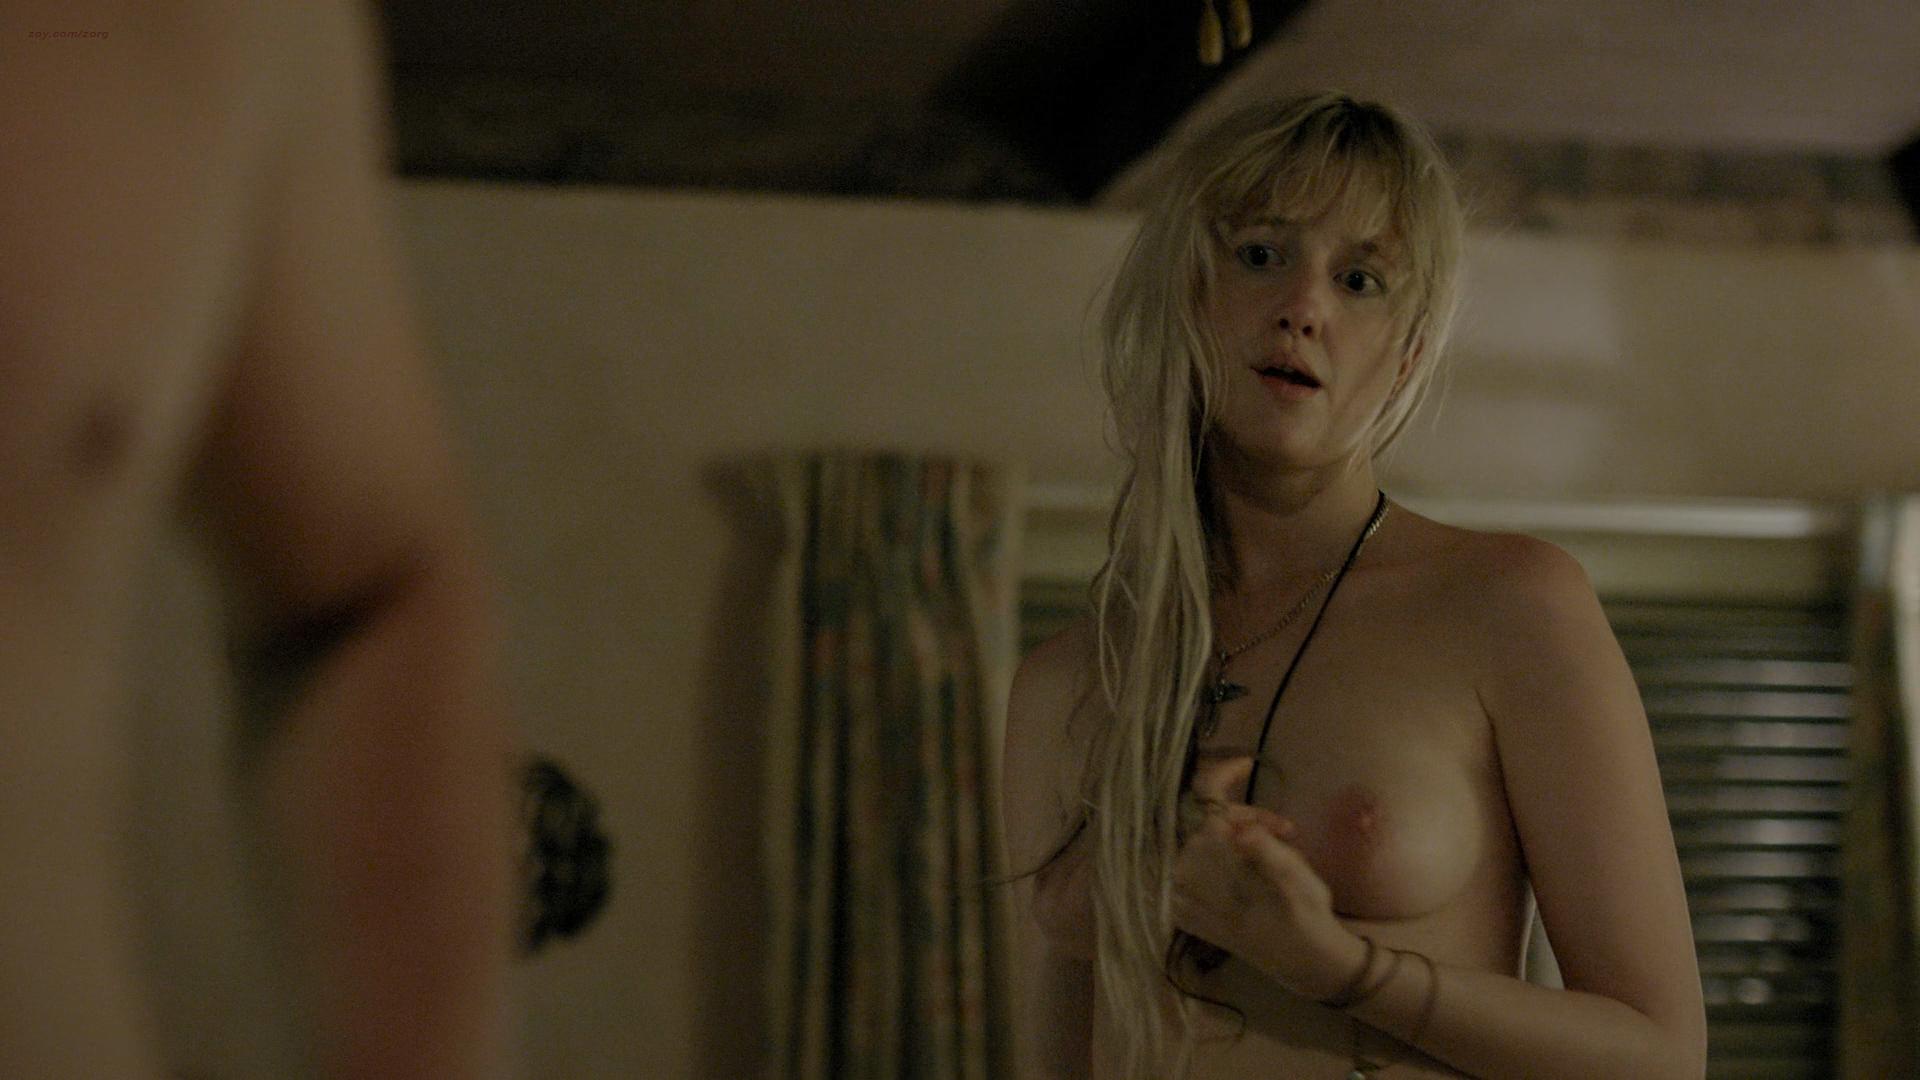 Andrea riseborough sex scene — photo 11